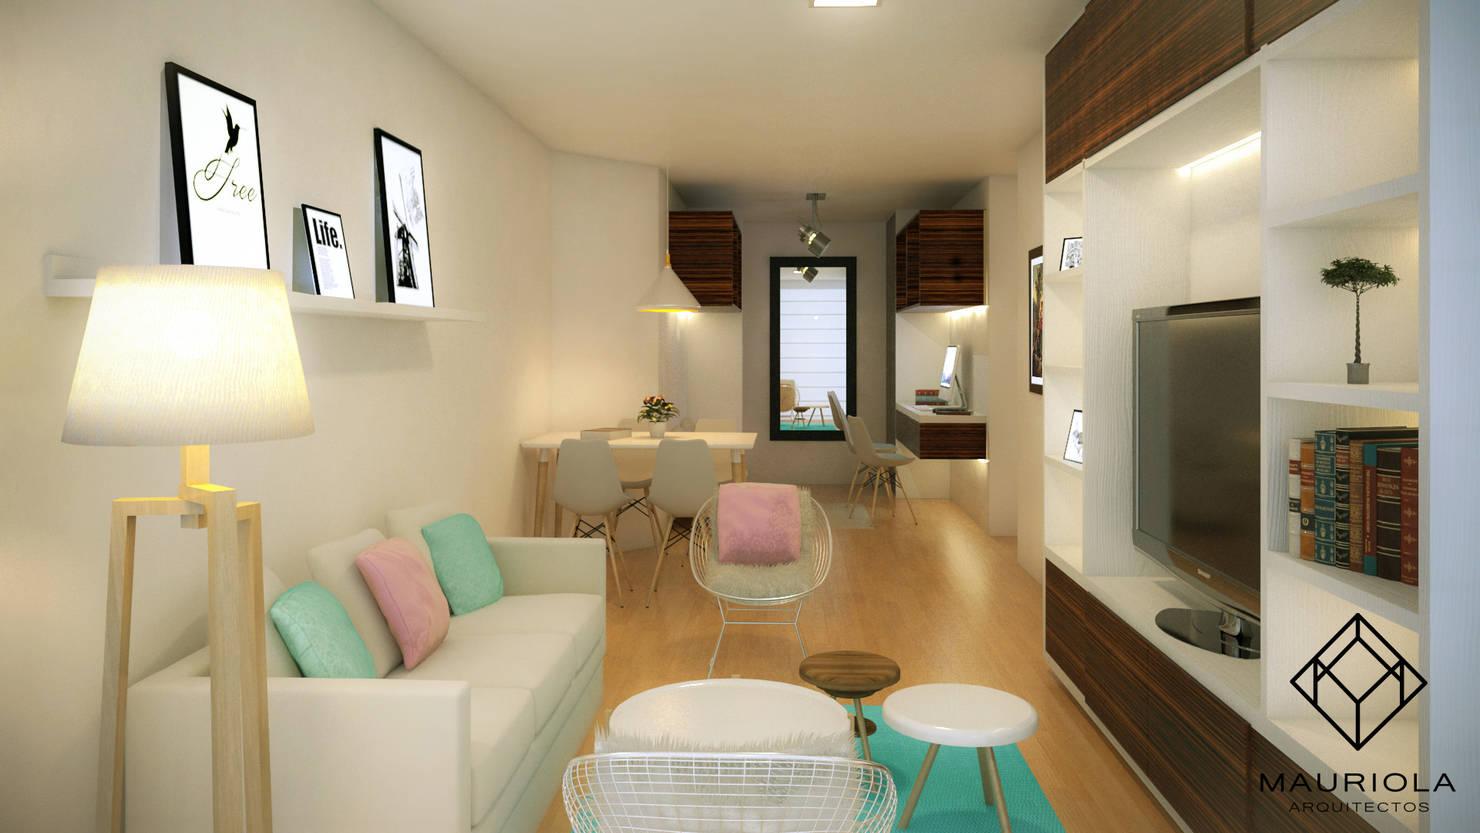 5 trucos para decorar un apartamento pequeño